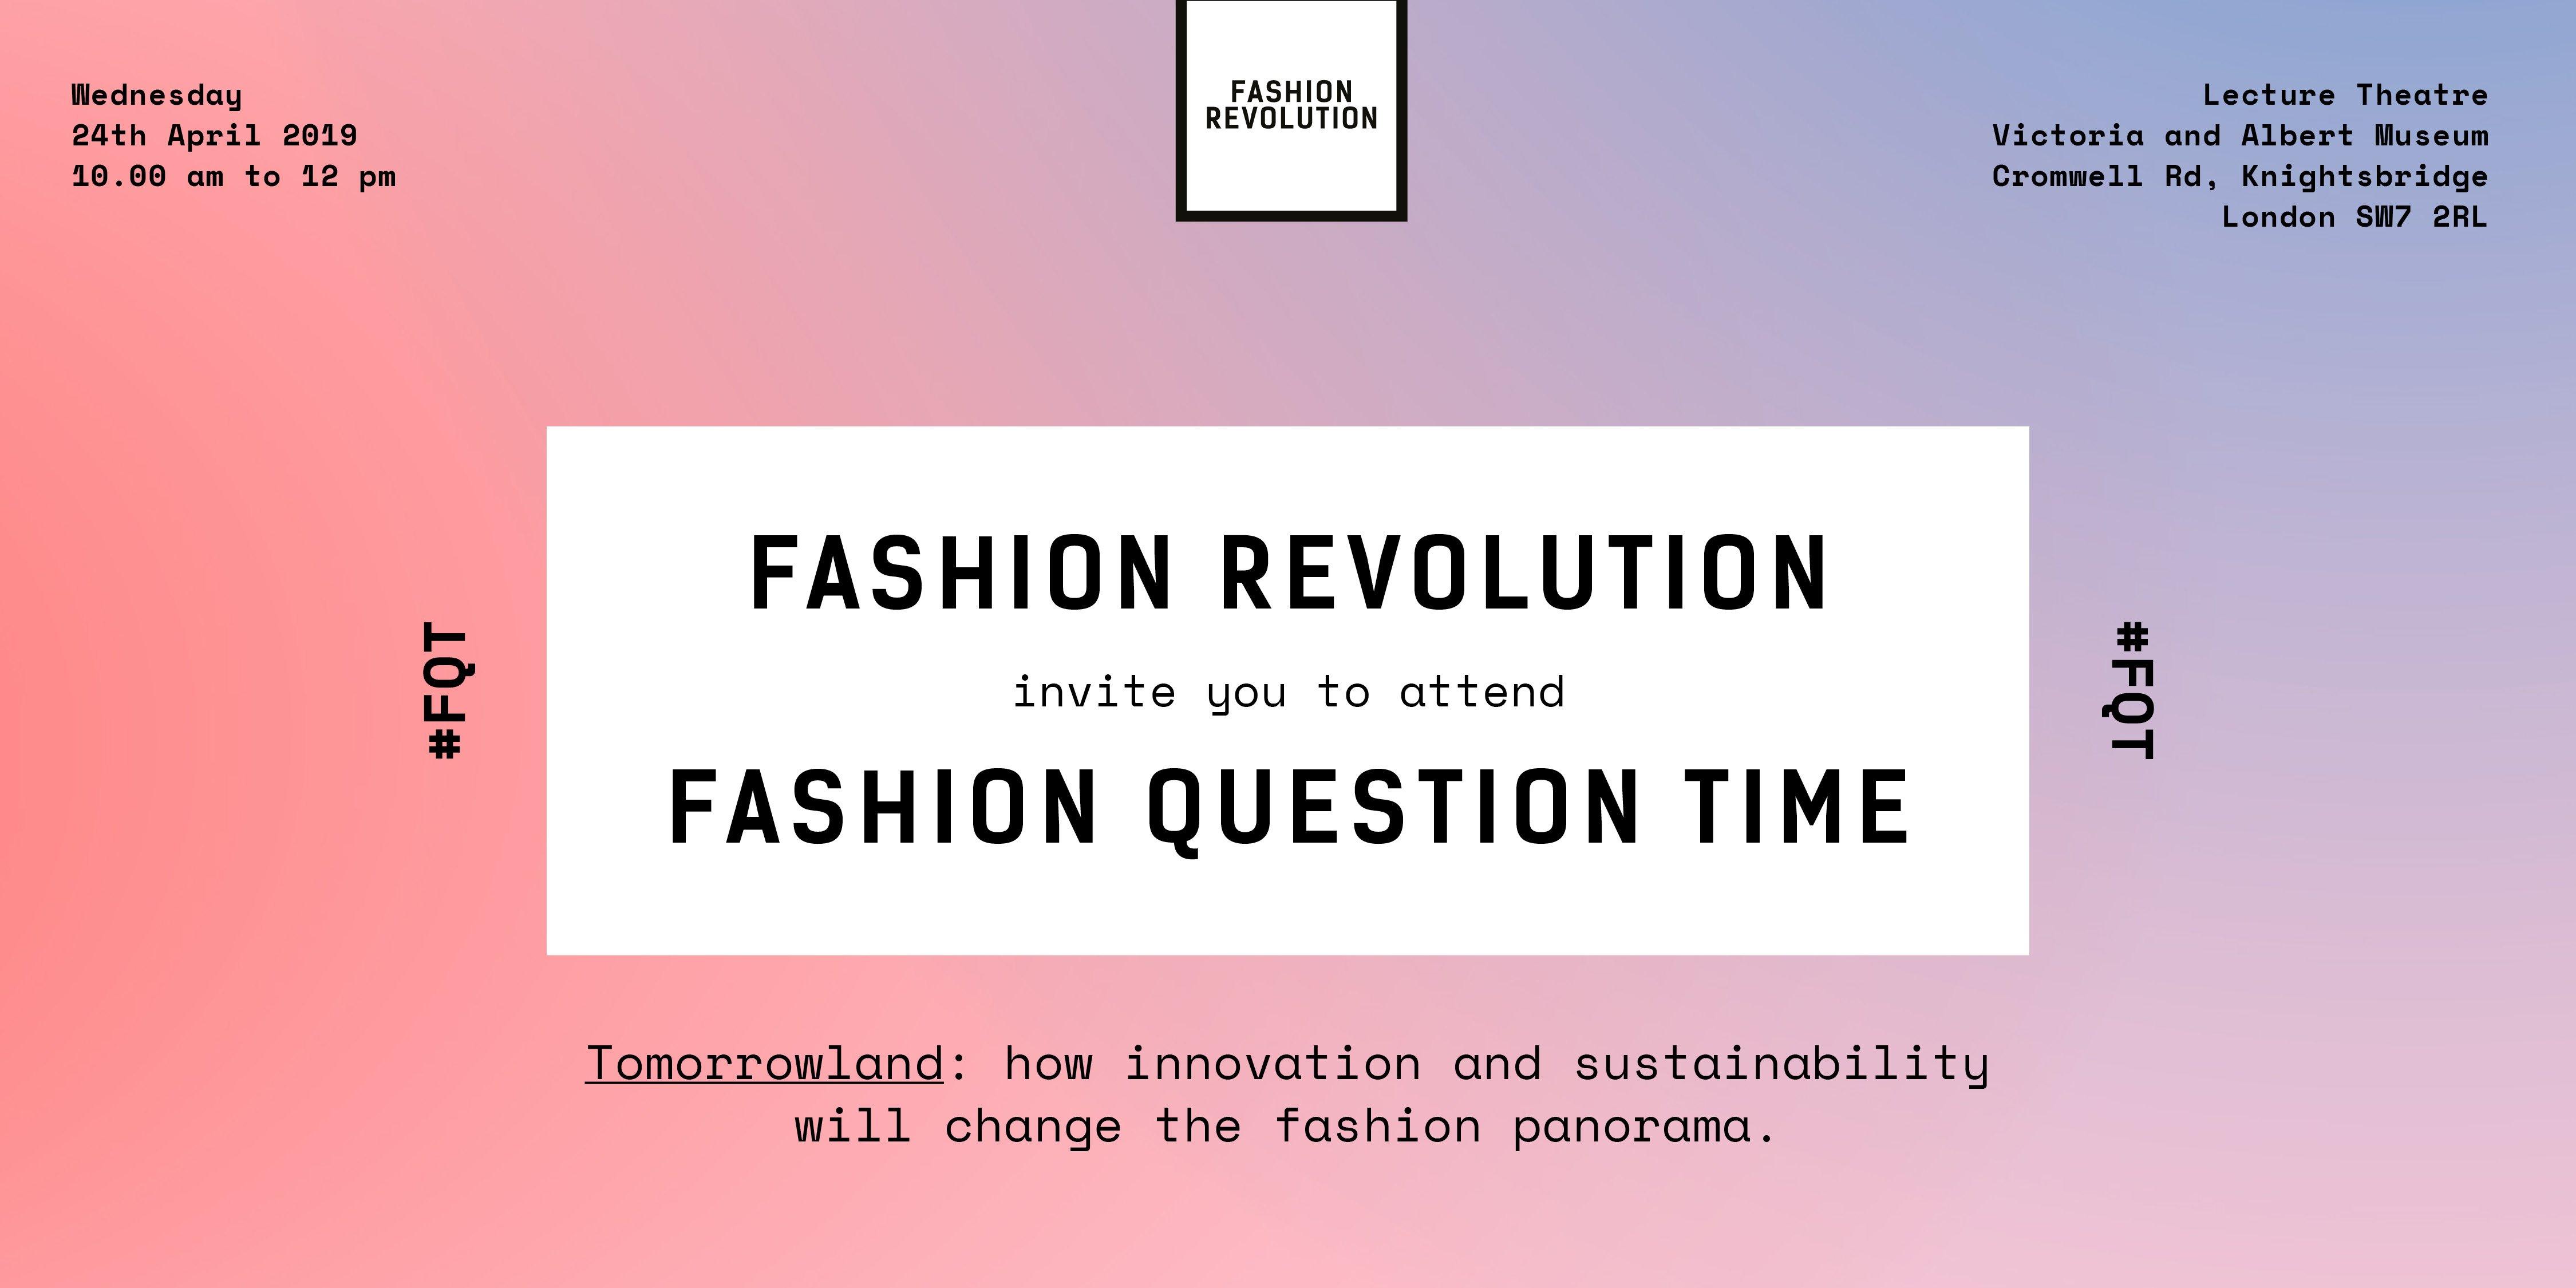 Fashion Question Time At The V&a - Fashion Revolution : Fashion V&a Calendar 2019